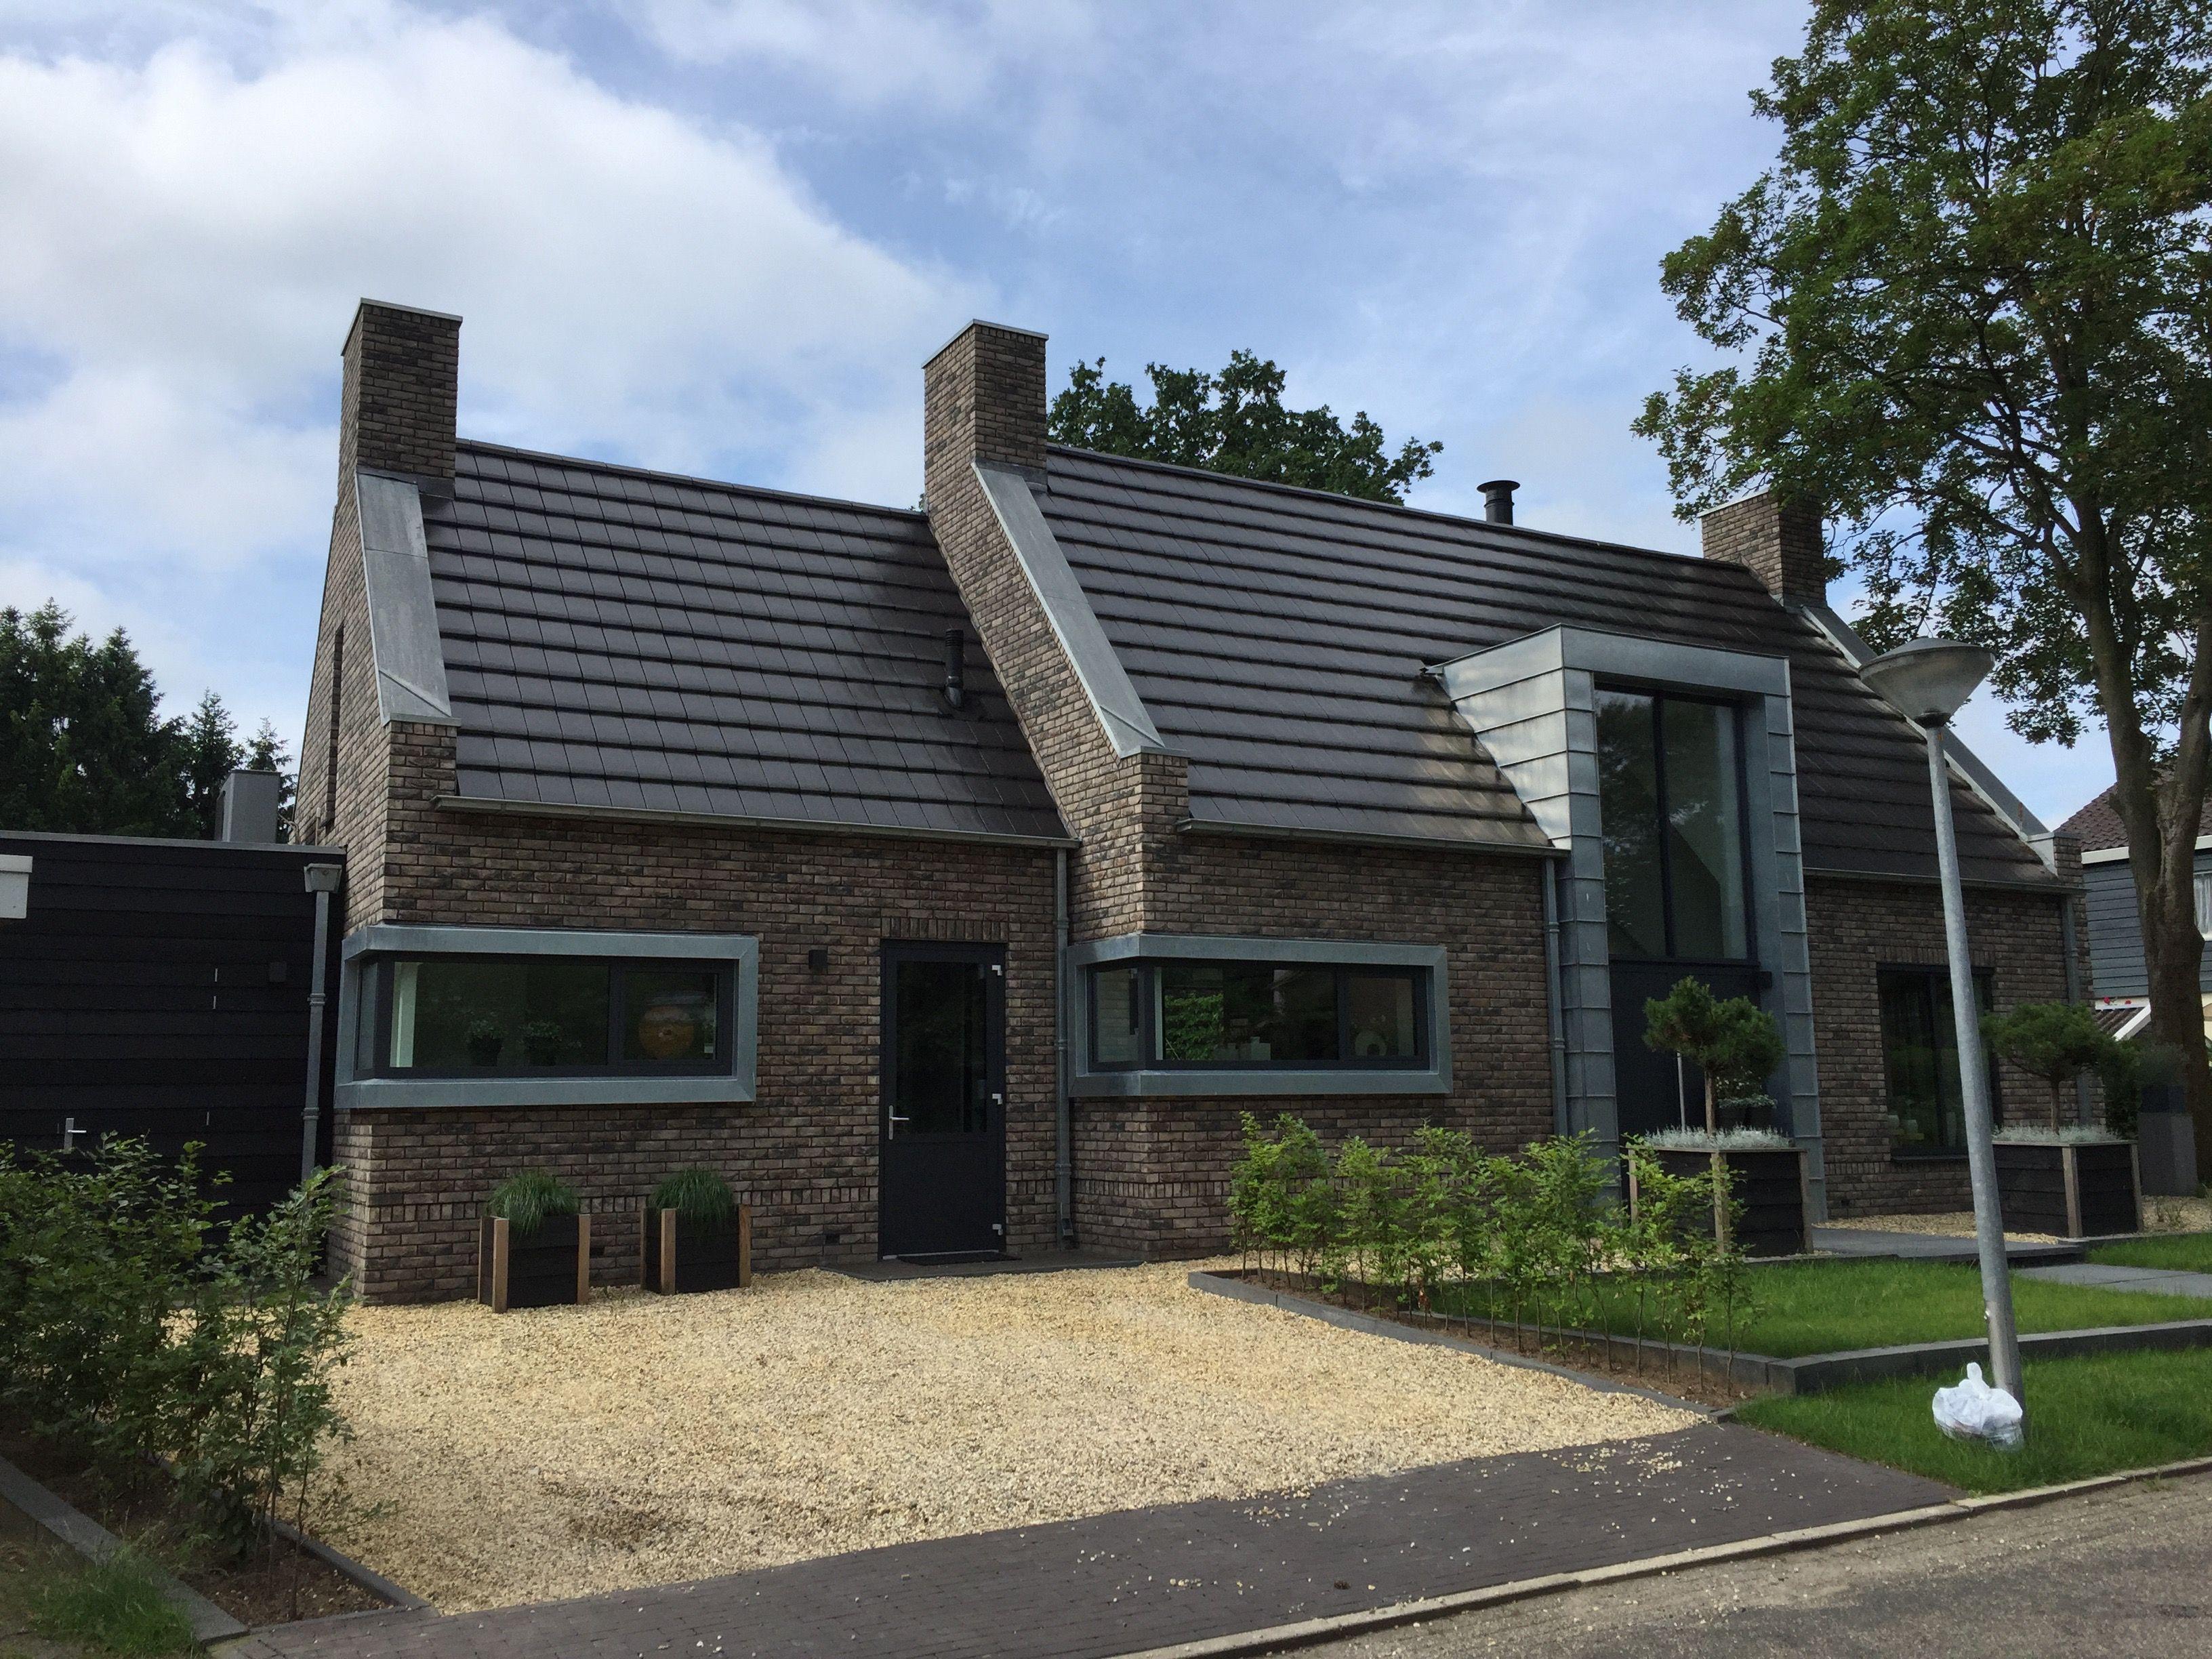 Afbeeldingsresultaat voor moderne woning gevel huizen pinterest house architecture and - Moderne huis gevel ...